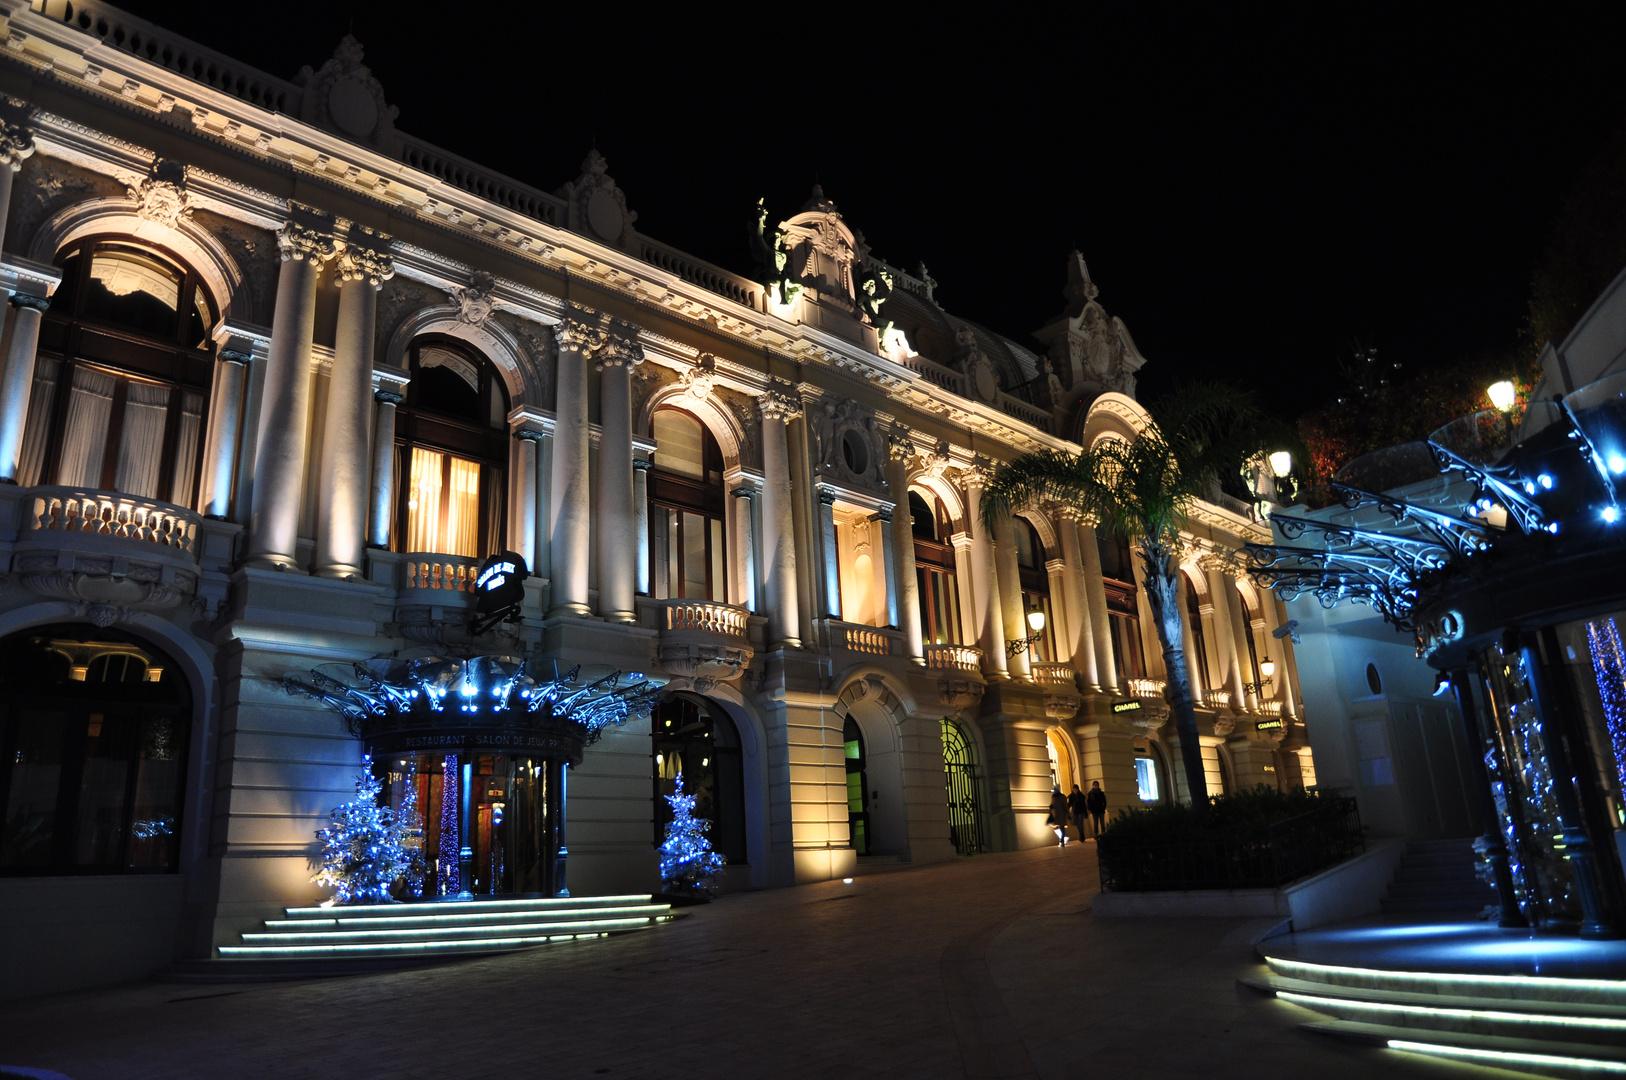 Seiteneingang vom Casino in Monaco